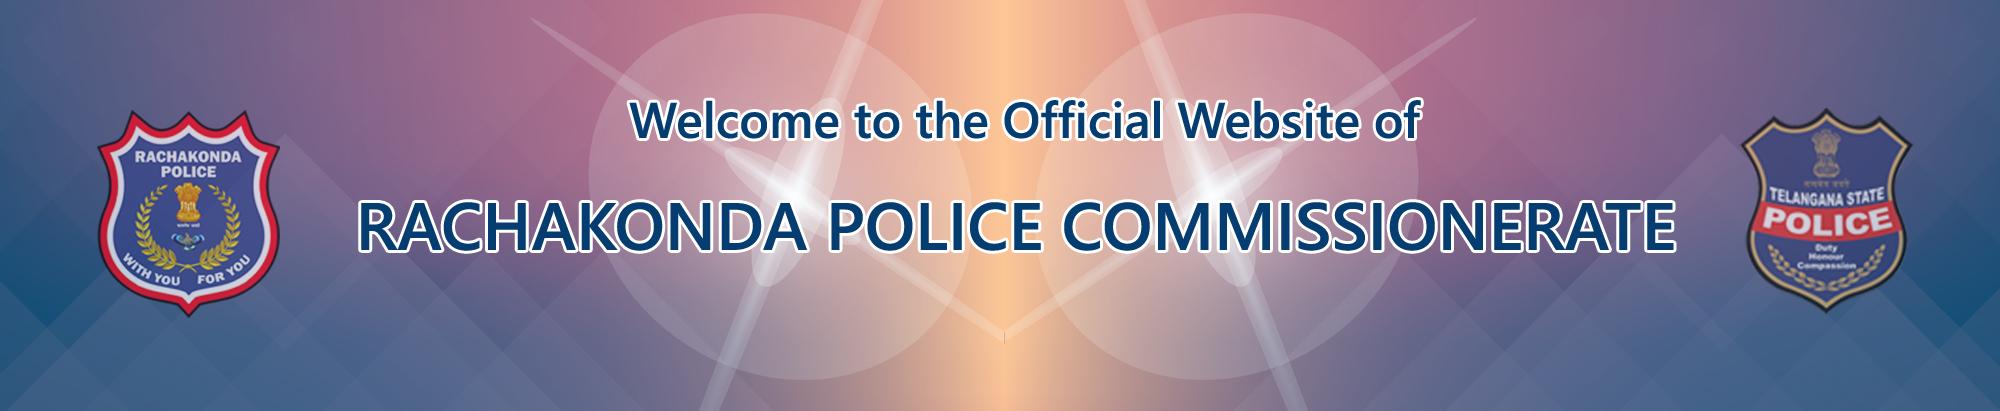 Rachakonda Police Commissionerate